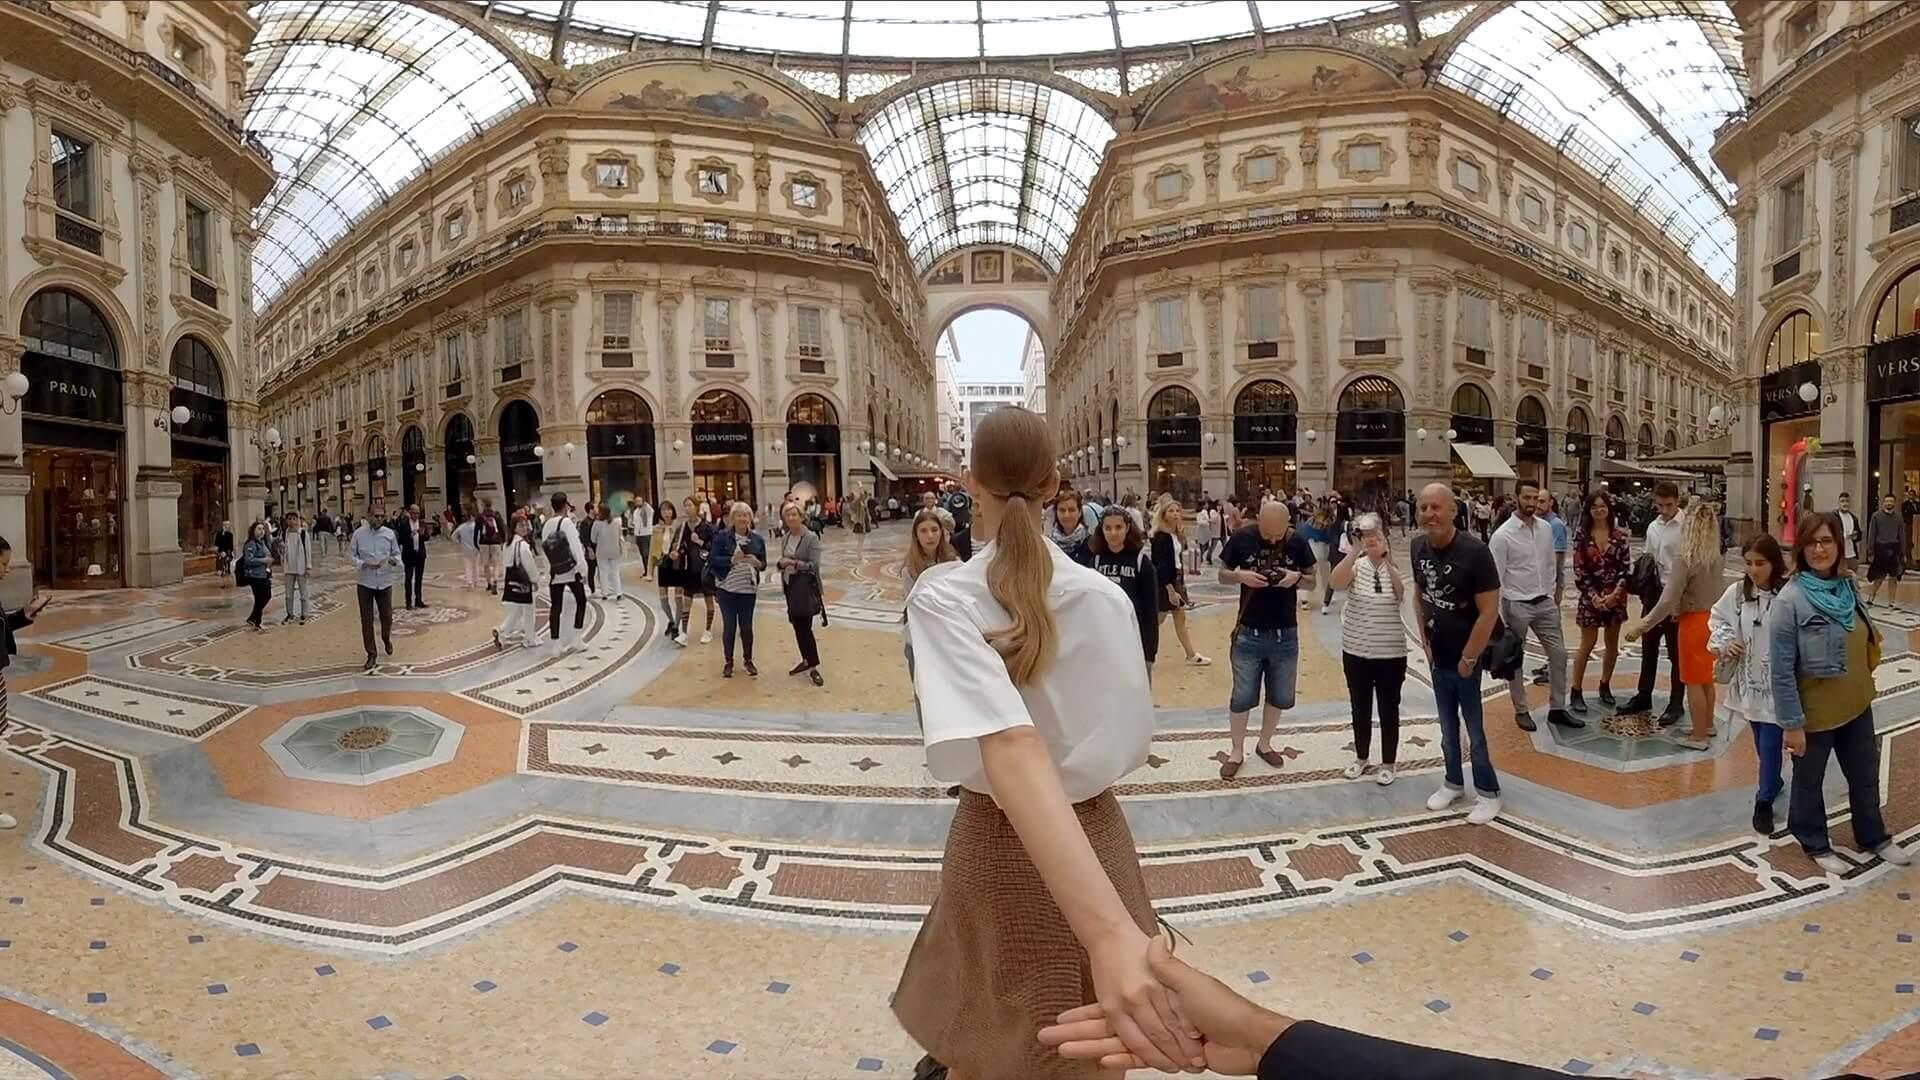 Luxury retail's virtual pivot